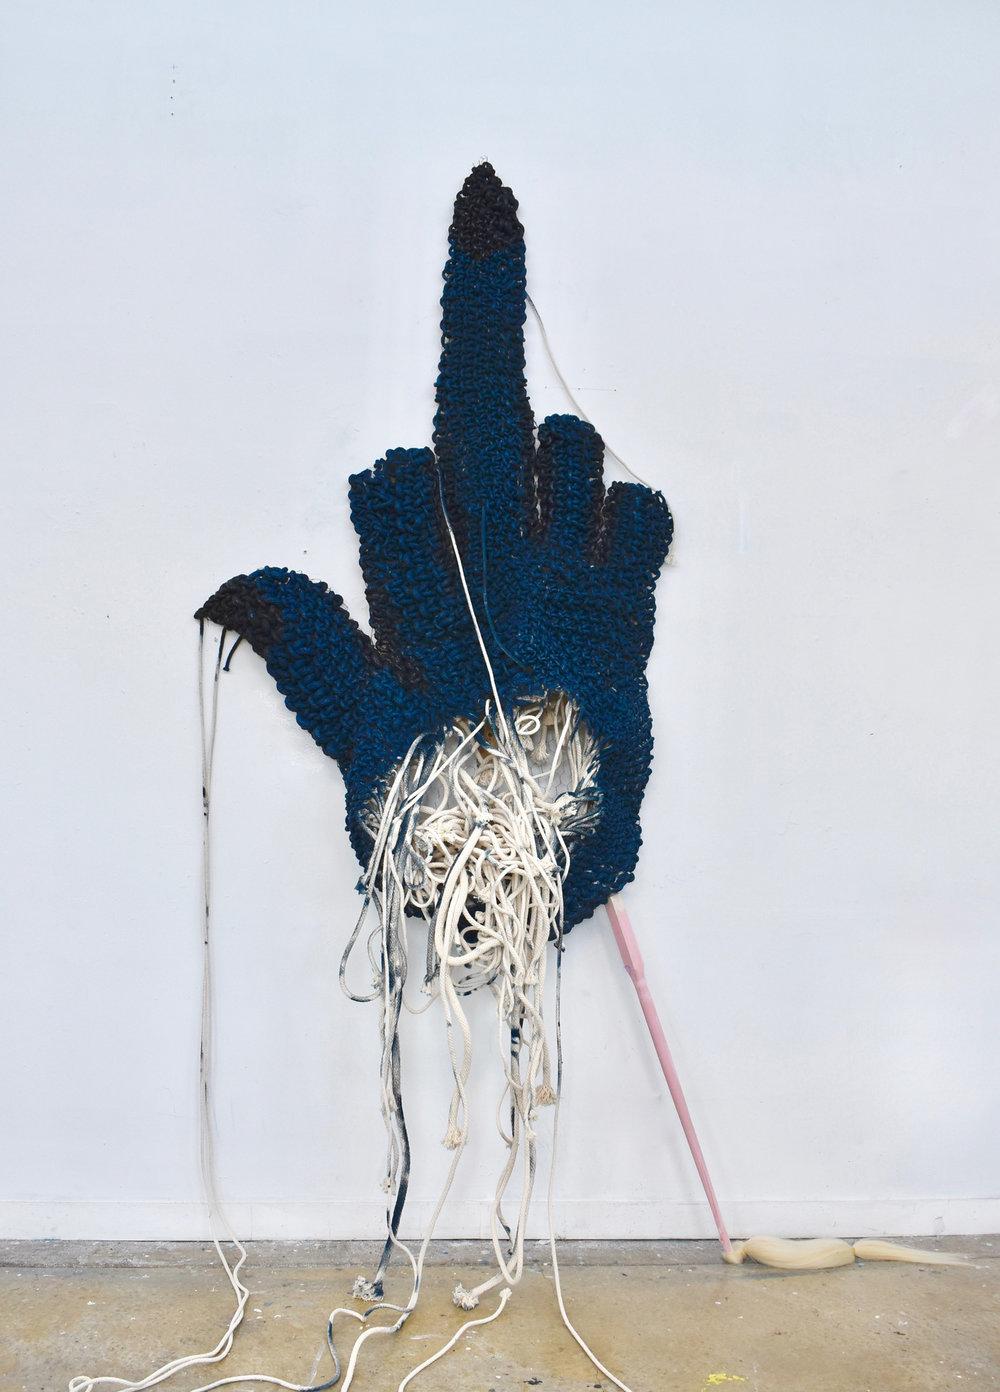 Jacqueline-Surdell-Artist-Sculpture-Snotty-Manus-13.jpg